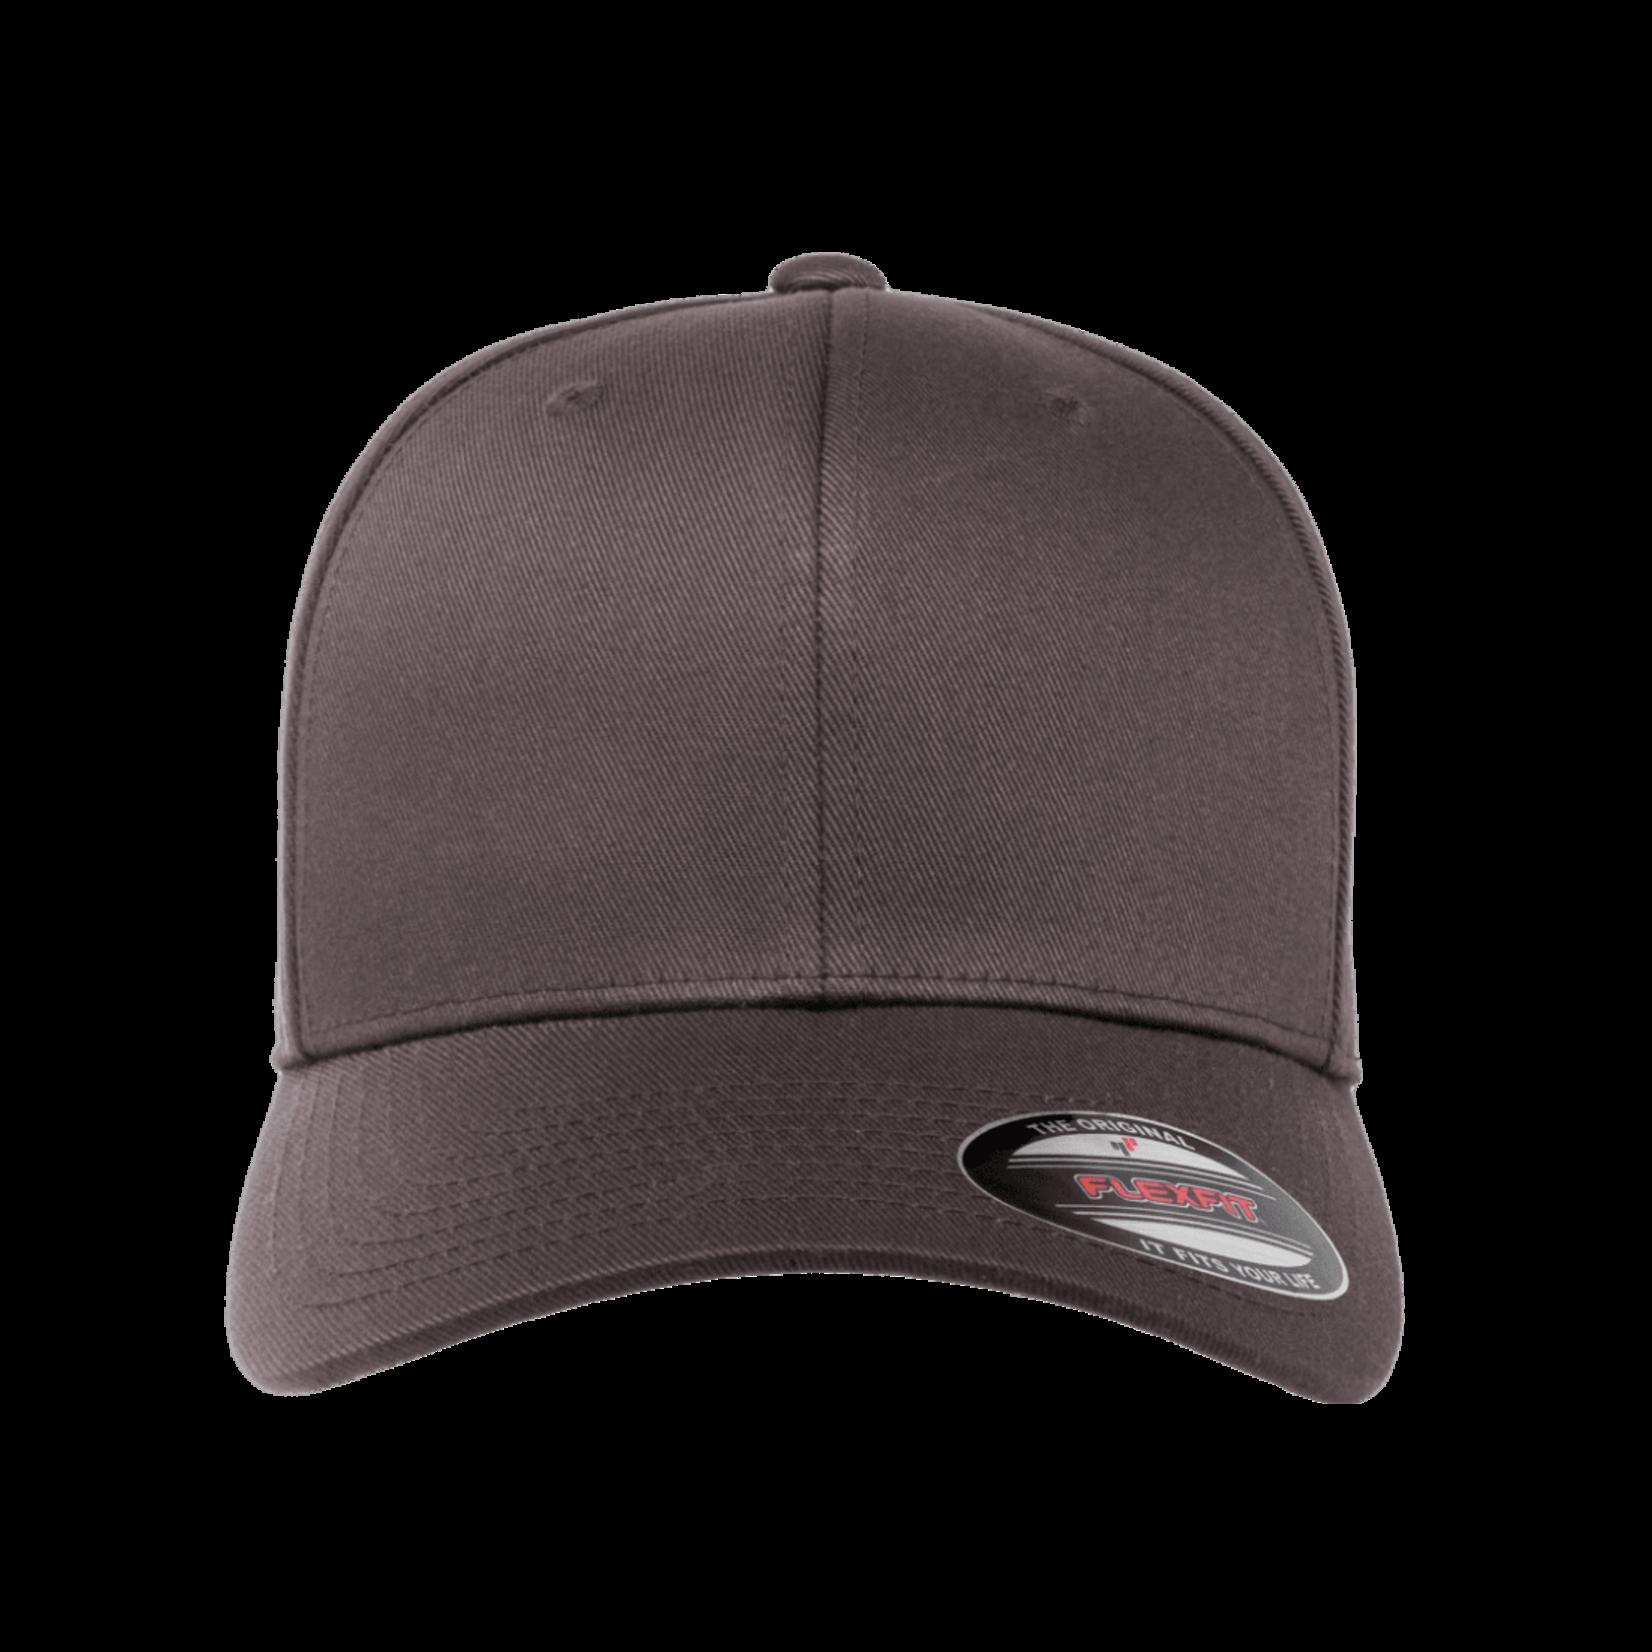 Flexfit Flexfit 6277 Classic Ballcap - Dark Grey